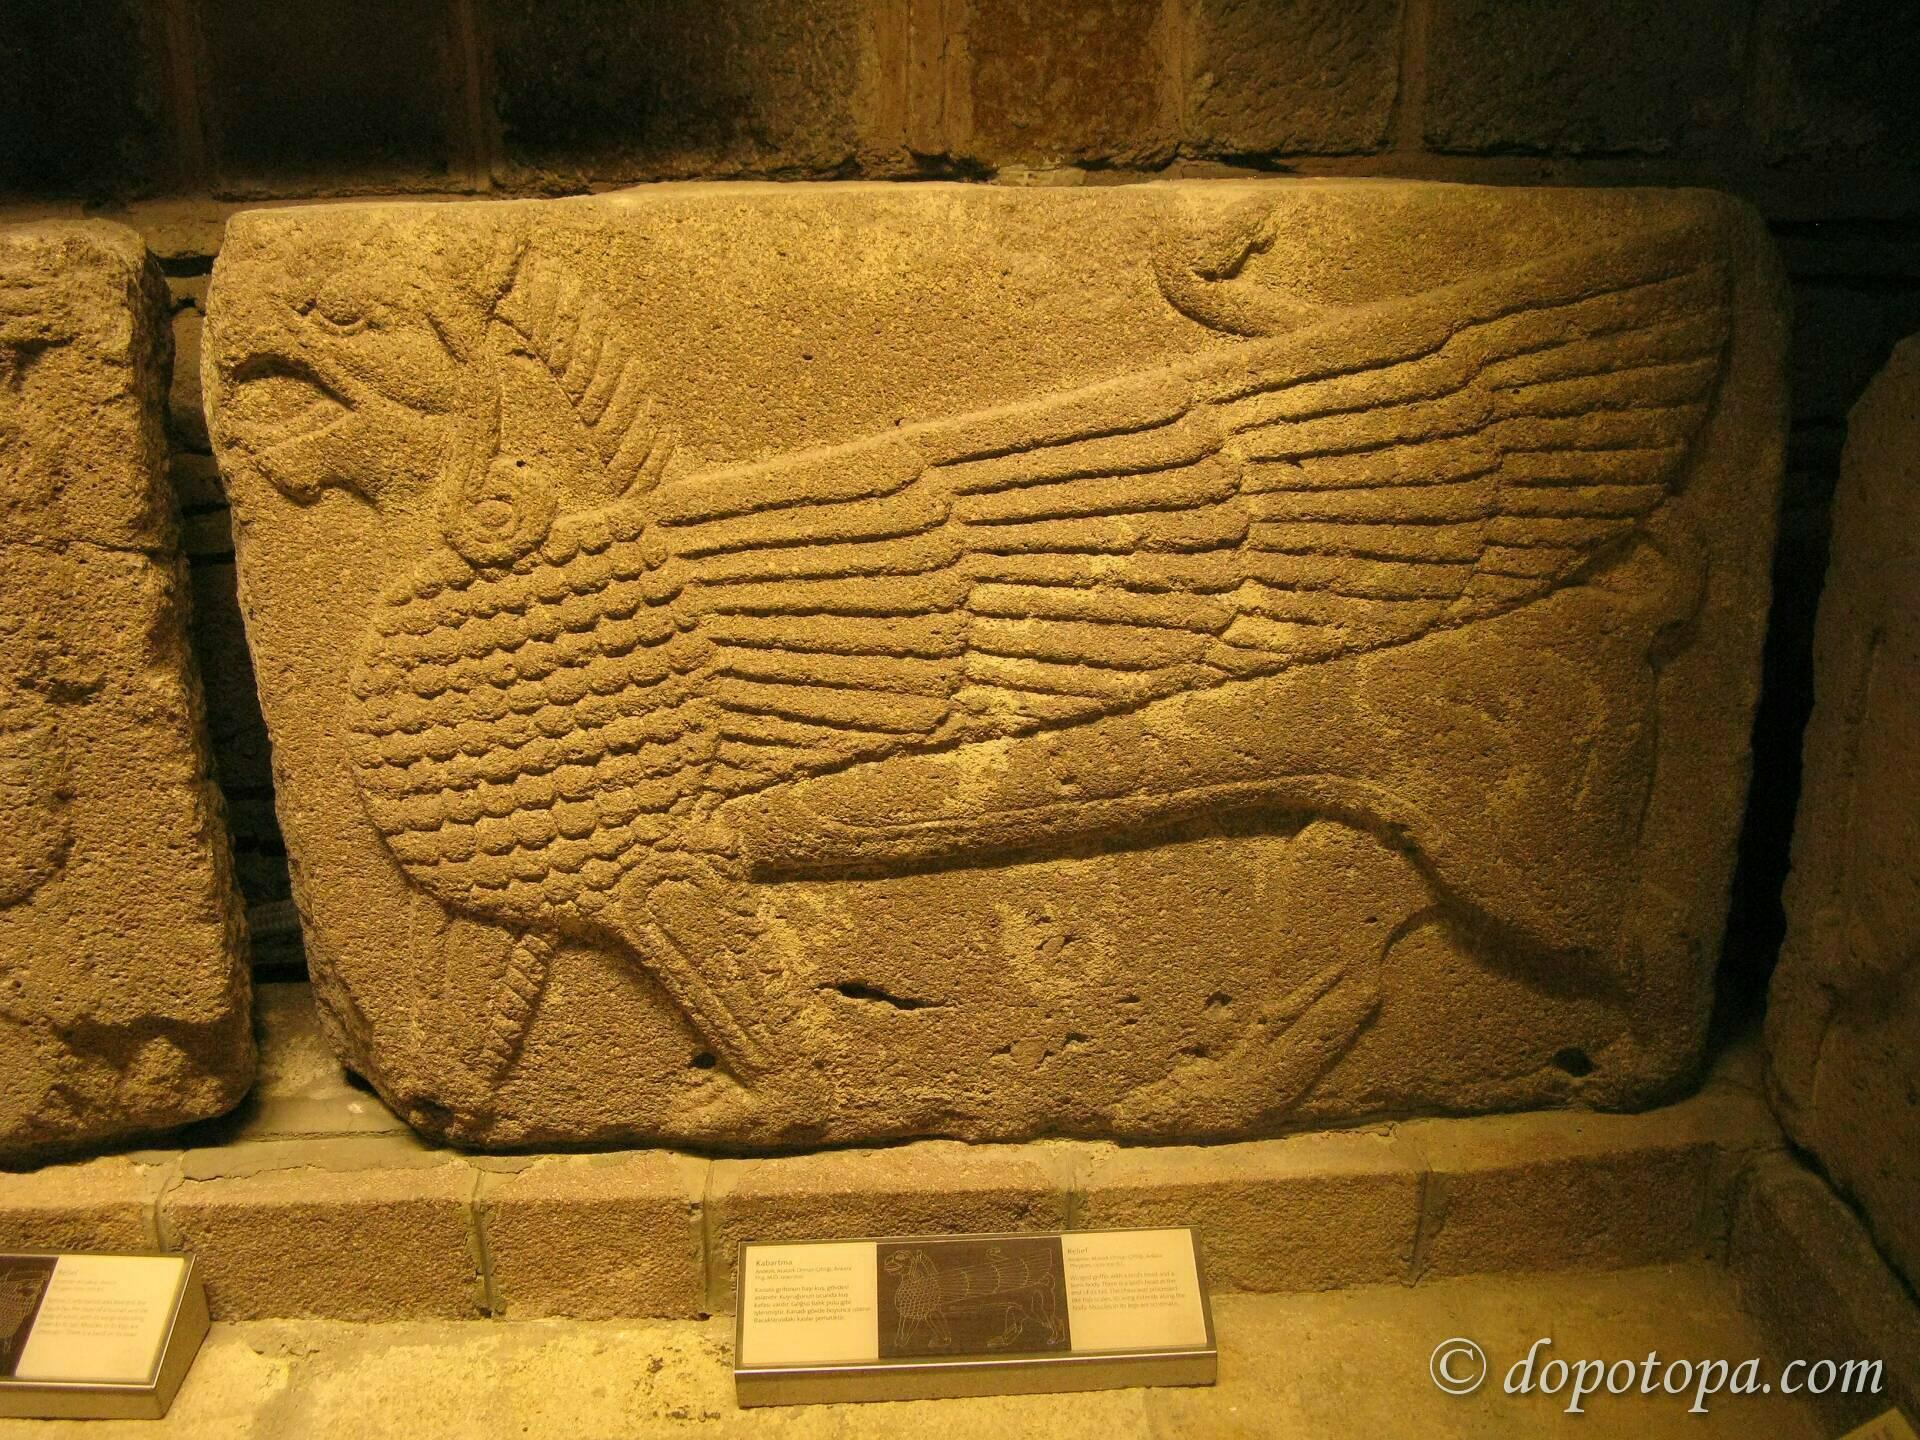 ankara_museum_stone_artefacts_20_1.JPG